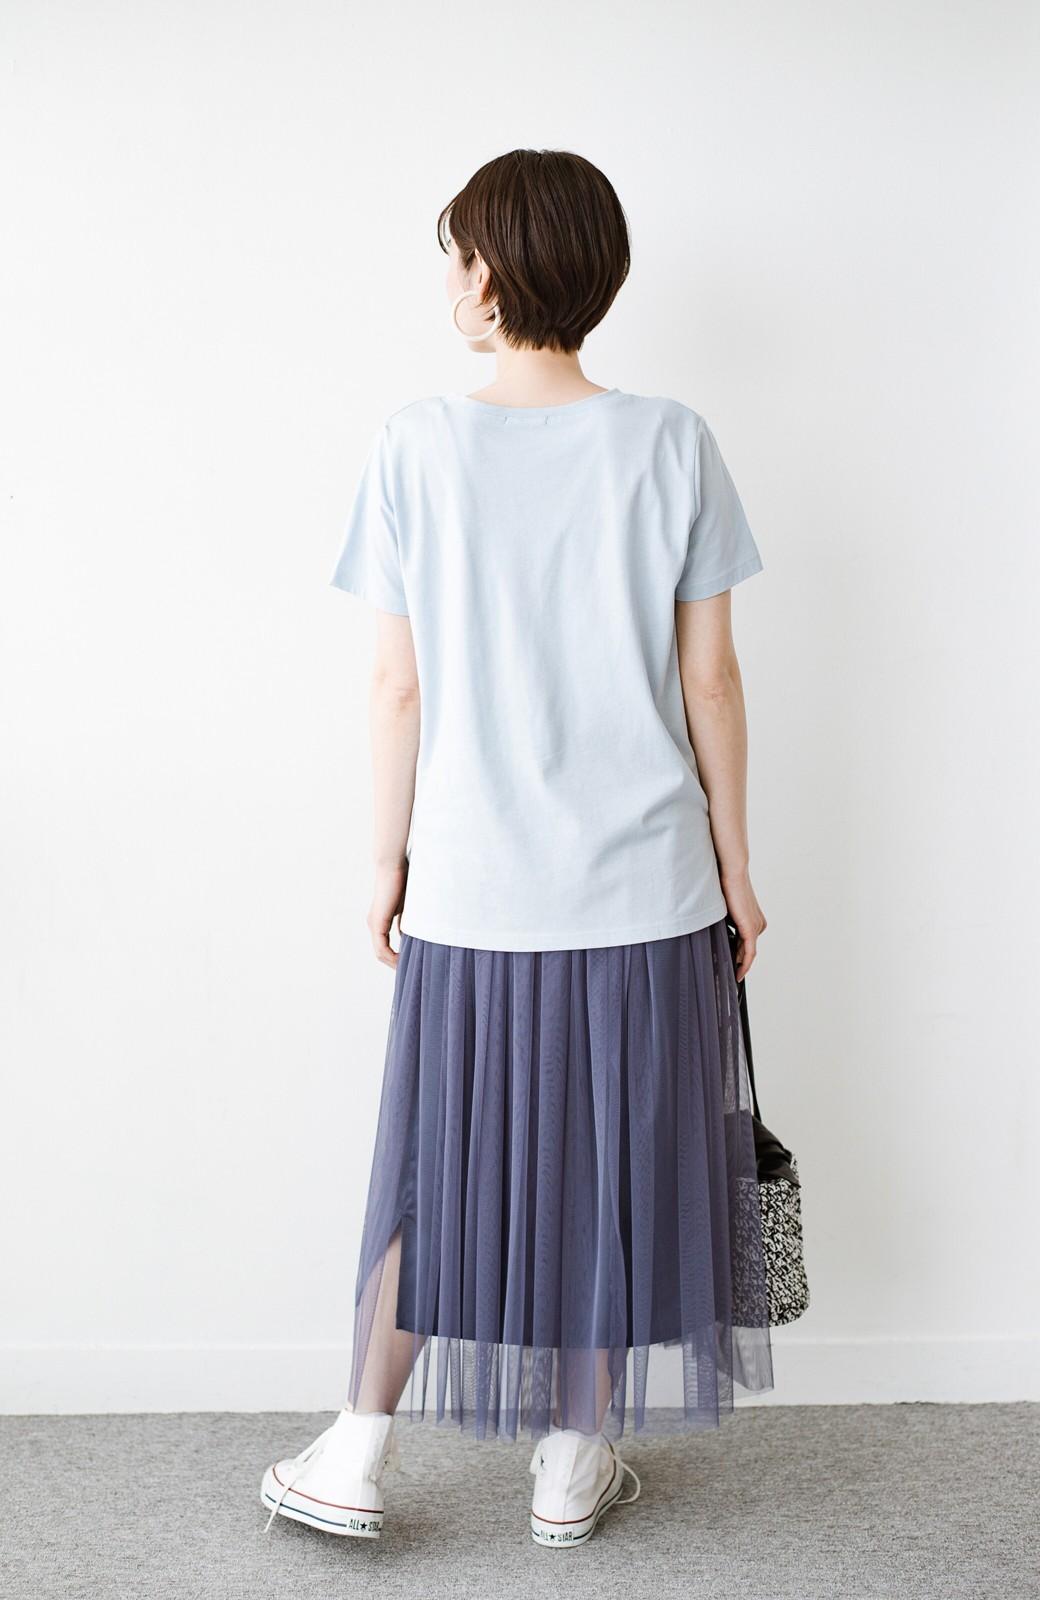 haco! 汗染み軽減加工で安心!1枚でも重ね着にも便利なシンプルTシャツ by ZAMPA <サックスブルー>の商品写真7